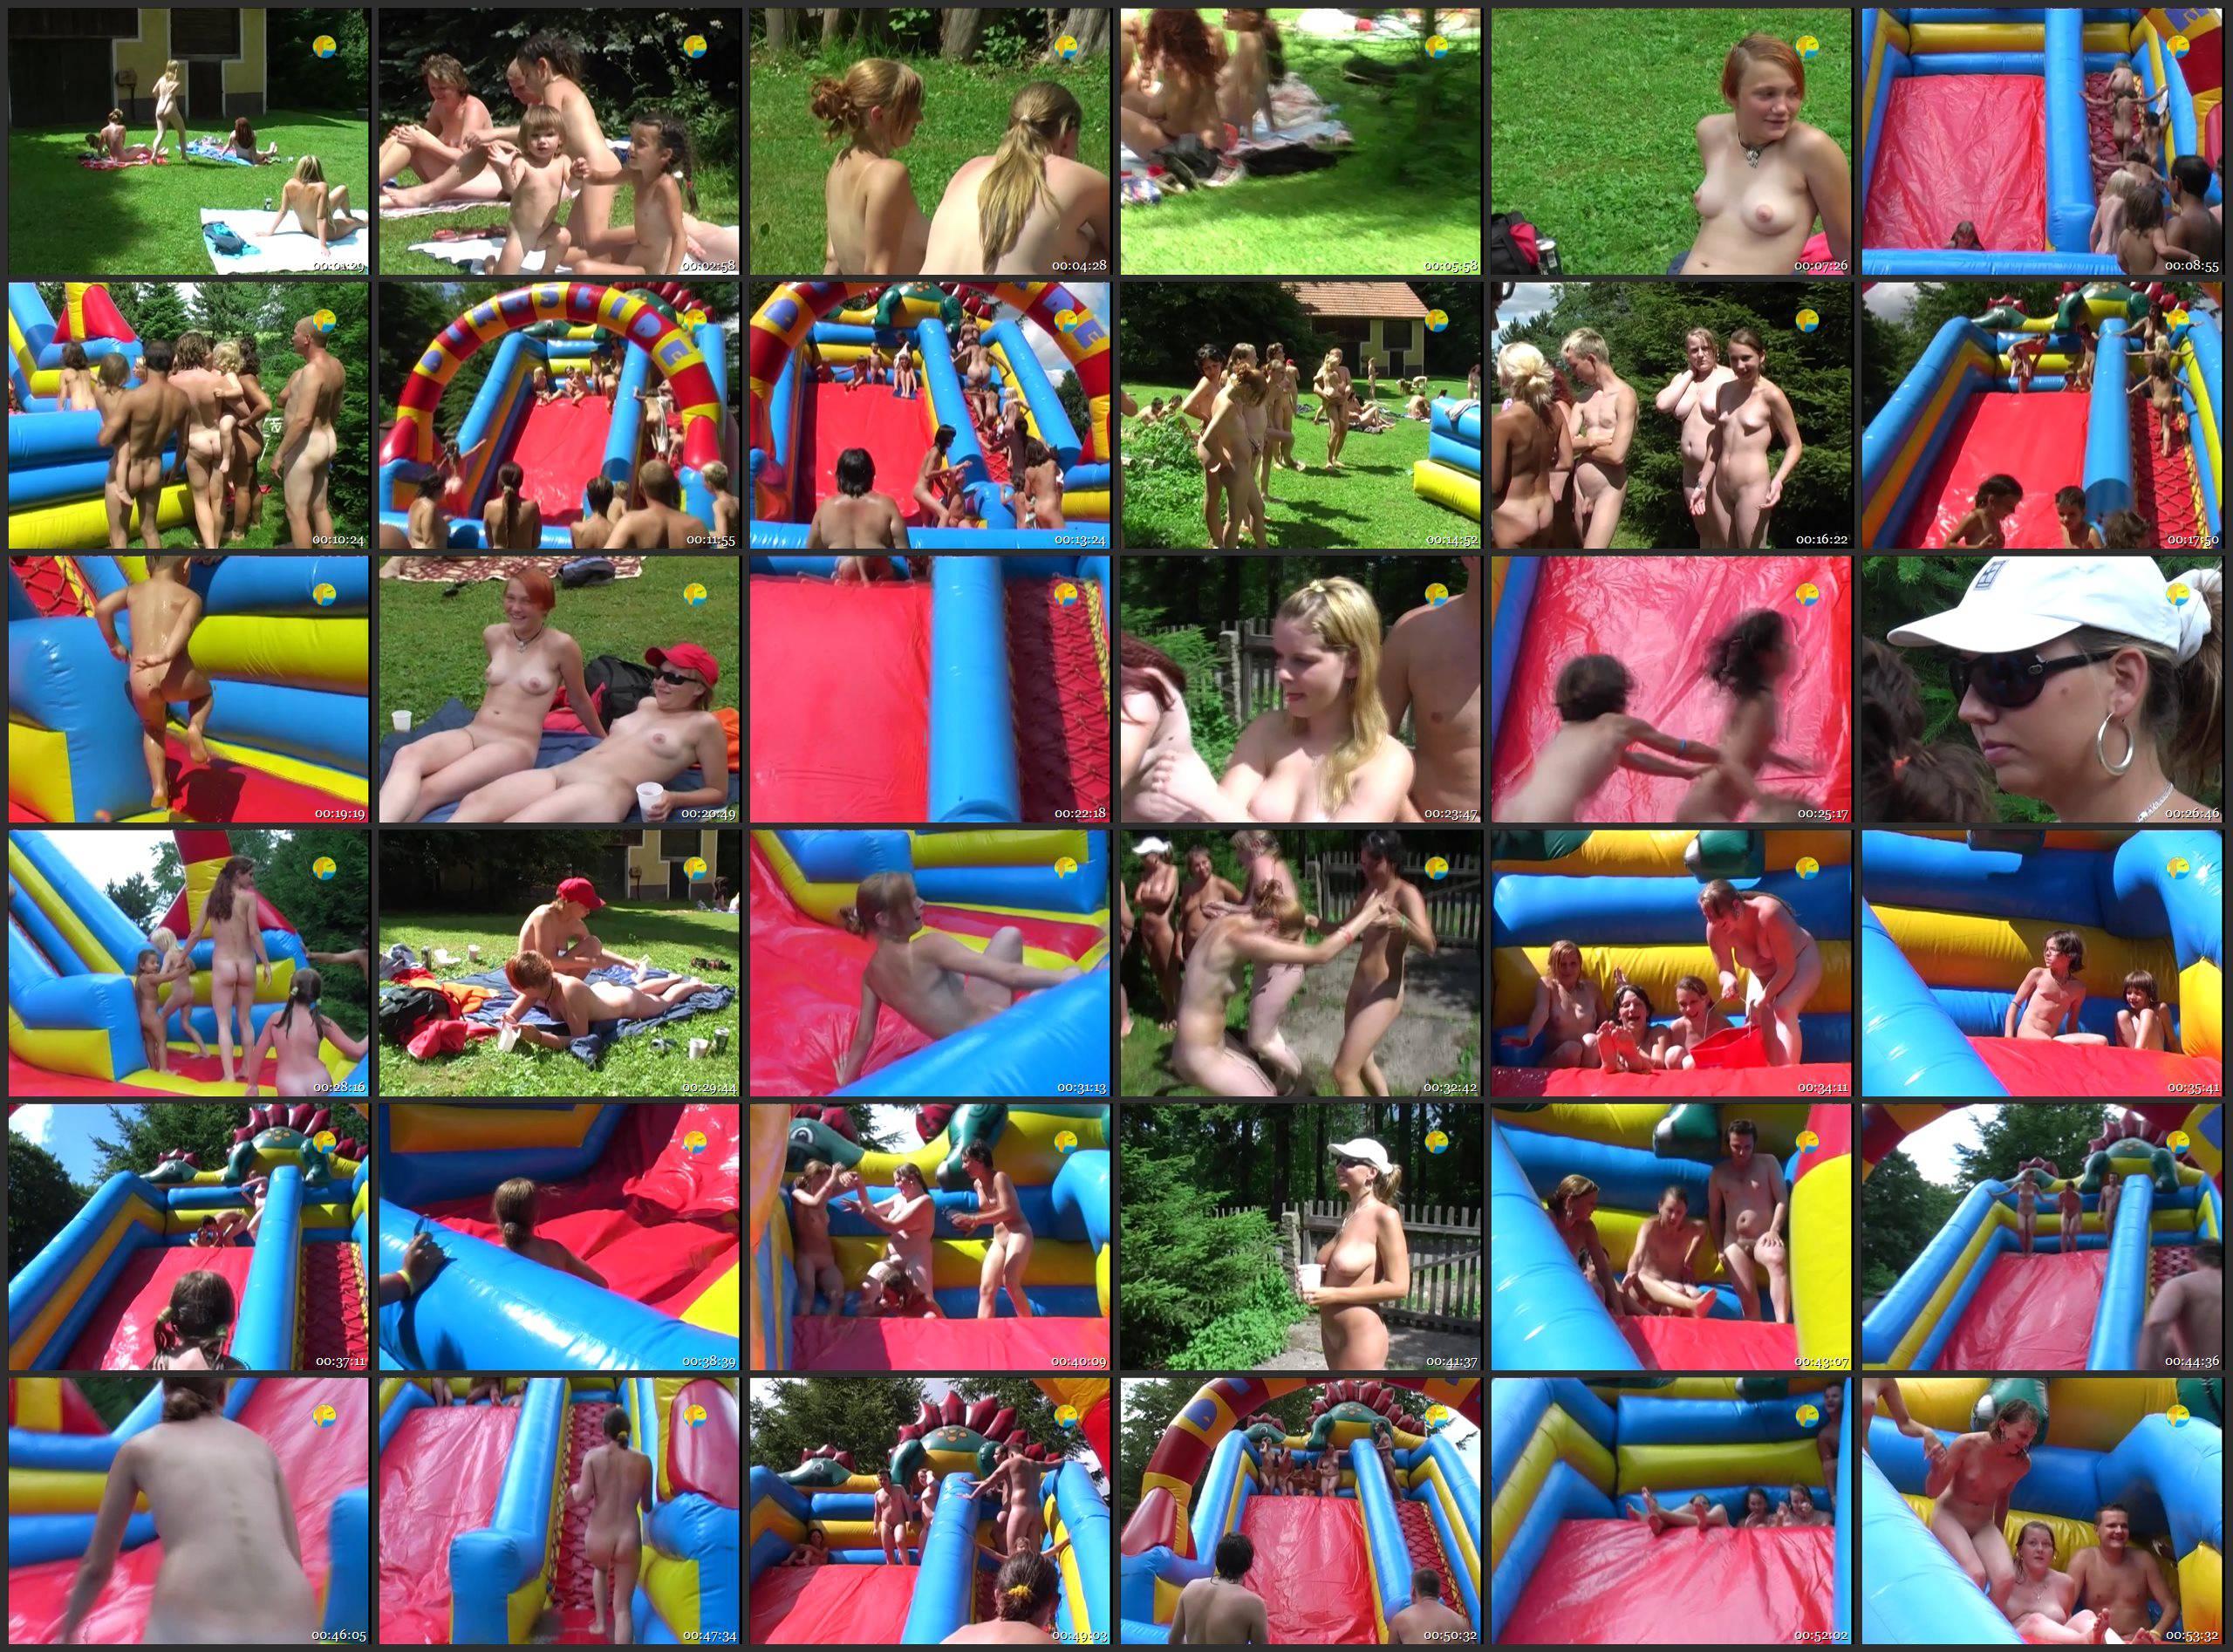 Naturist Freedom-Inflatable Slide - Thumbnails